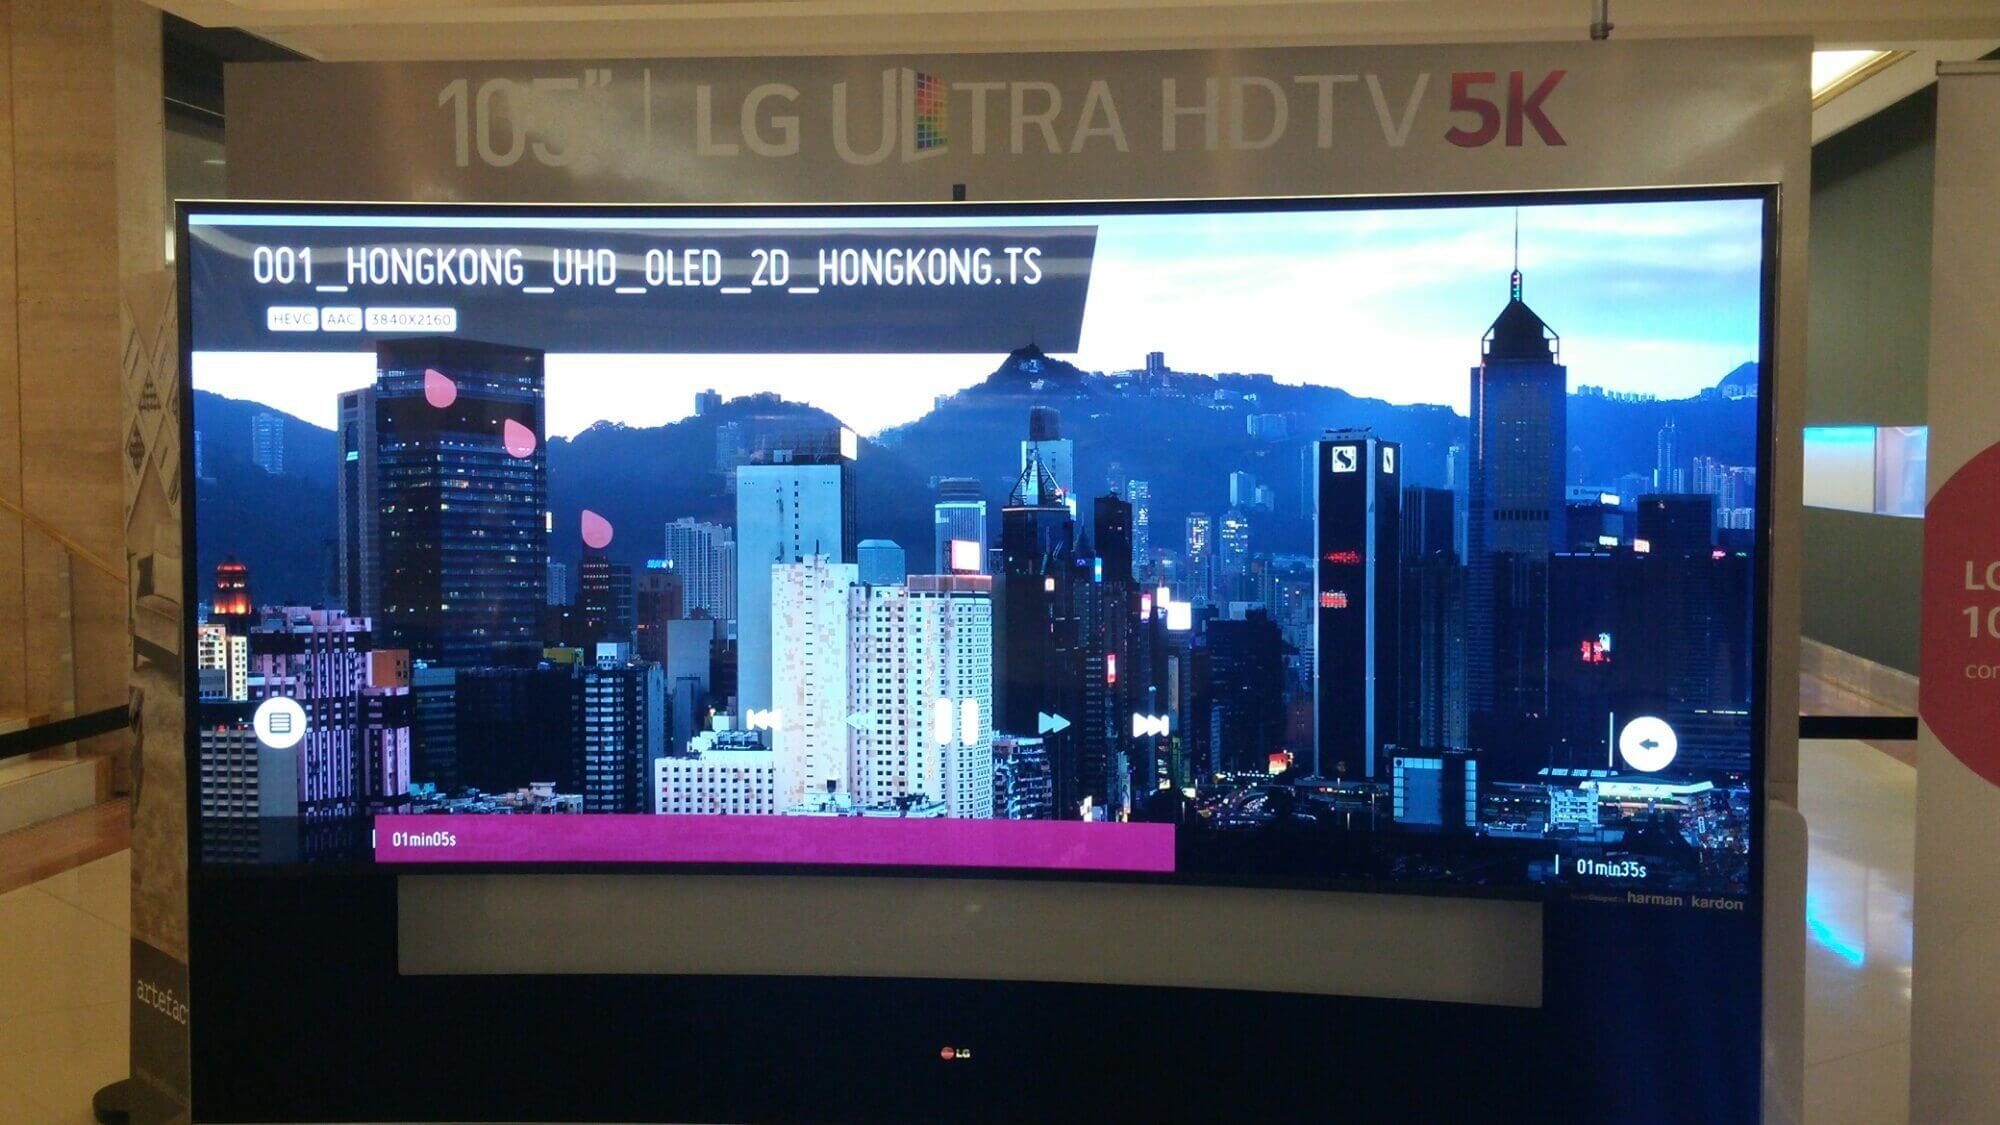 wpid wp 1417092113431 - LG ultrapassa o 4K e lança TV Ultra HD 5K no Brasil